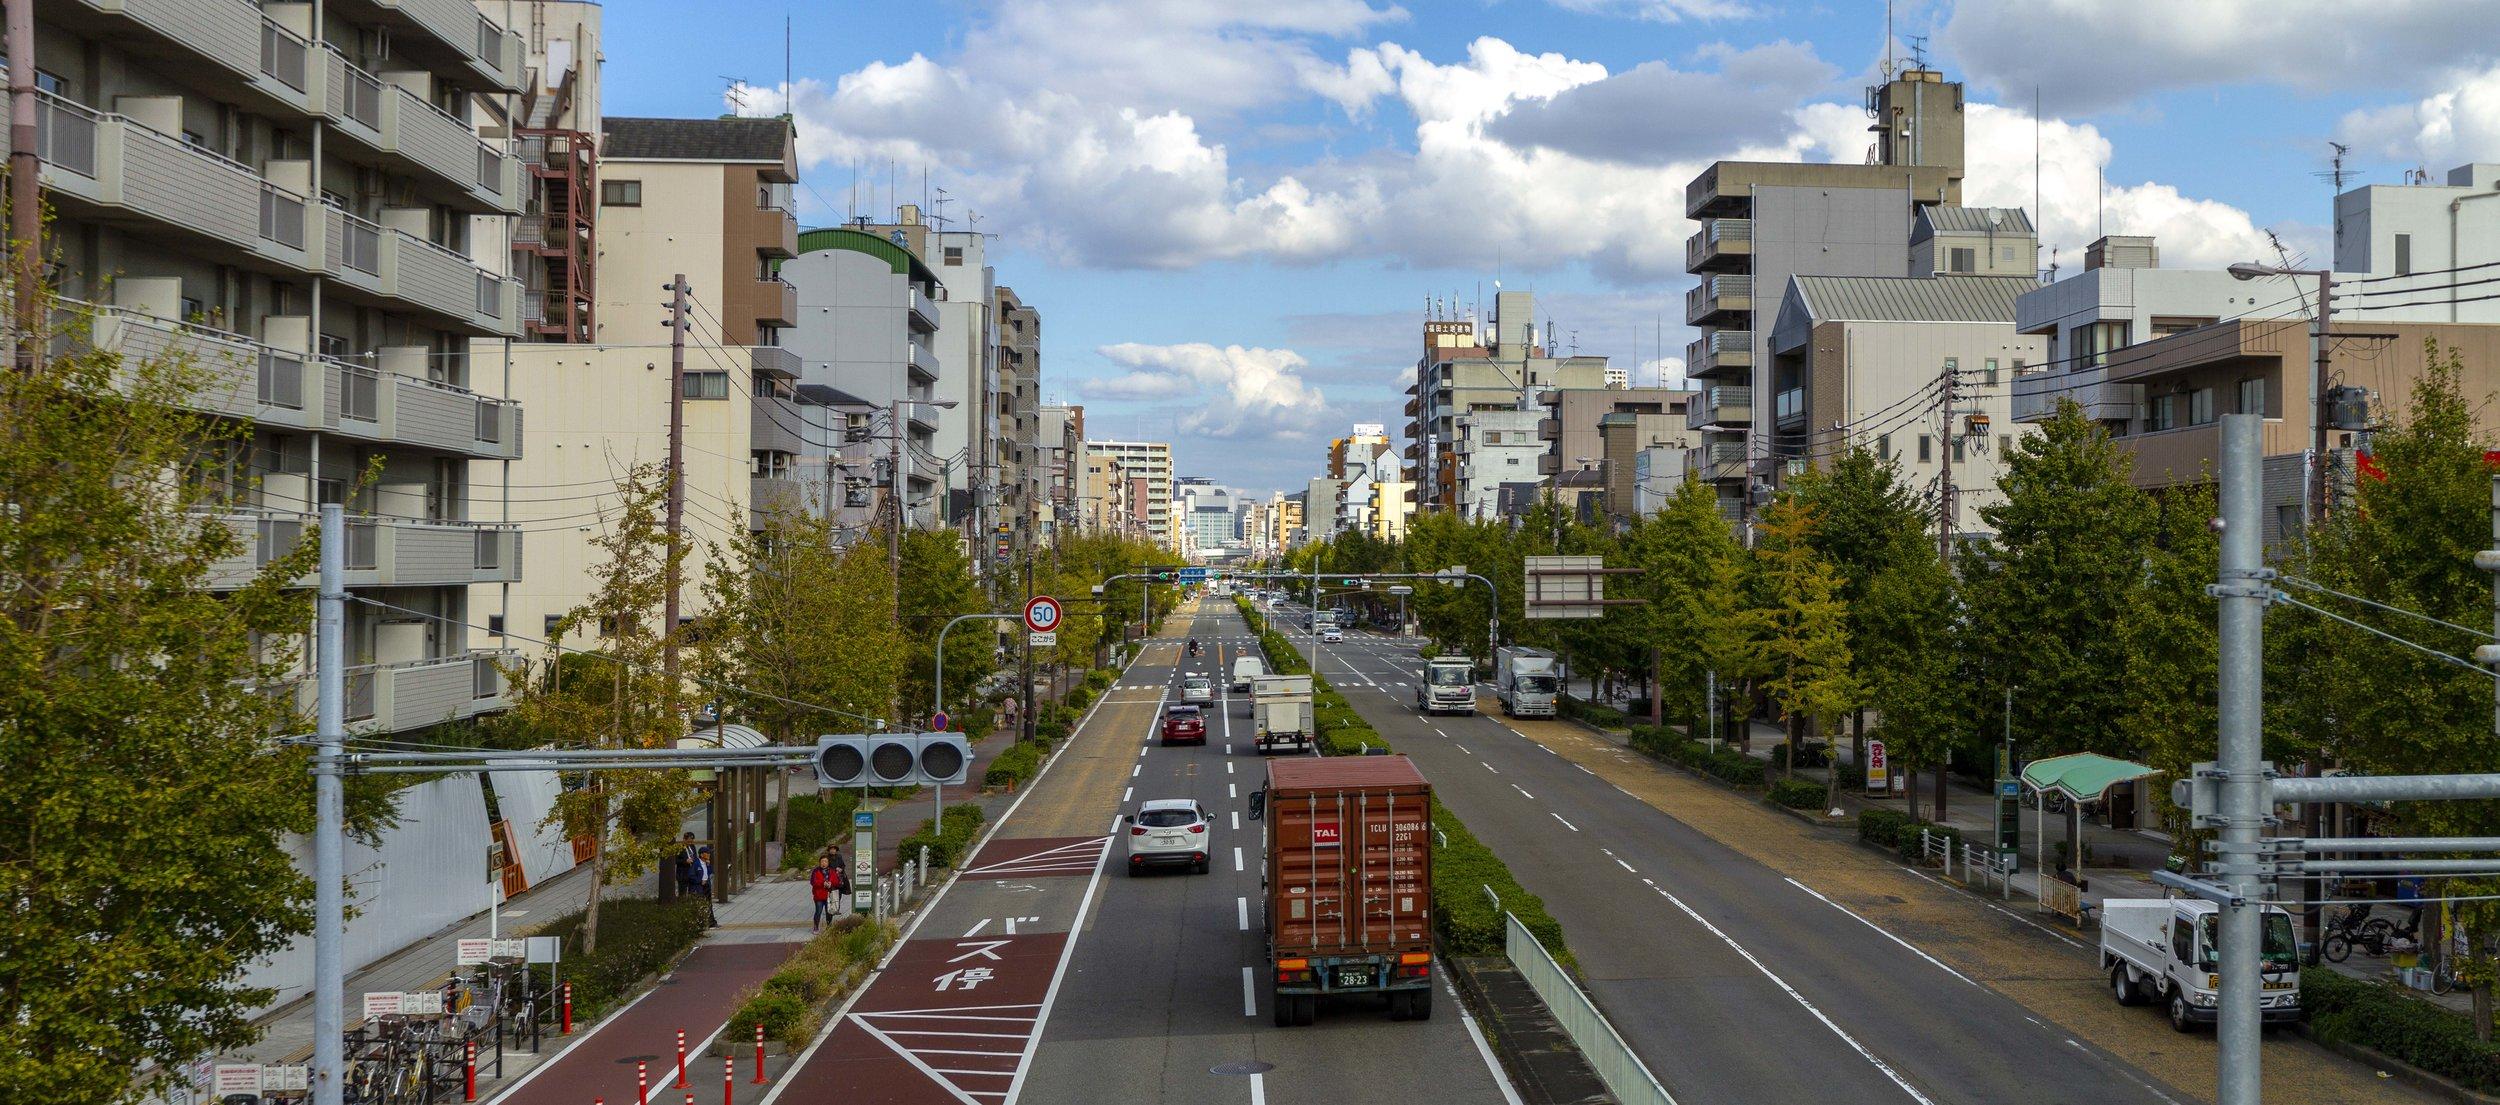 Wandering the streets of Osaka